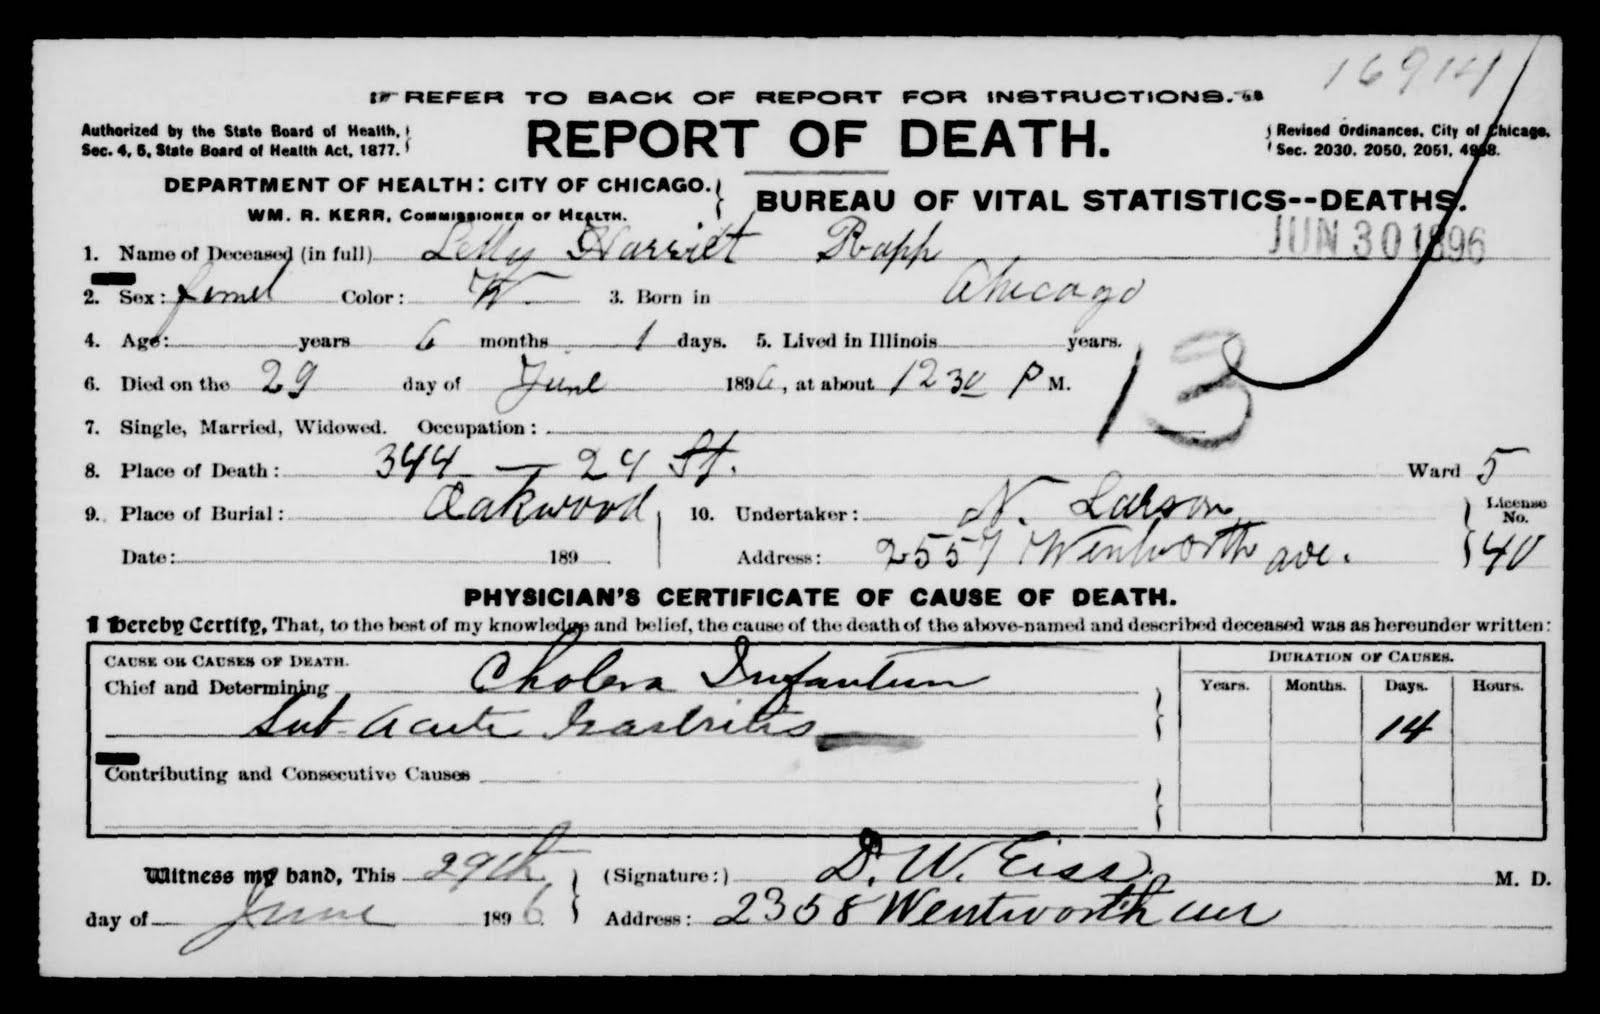 It\'s All Relative: A Child Lost ~ Lillian Harriet Rapp